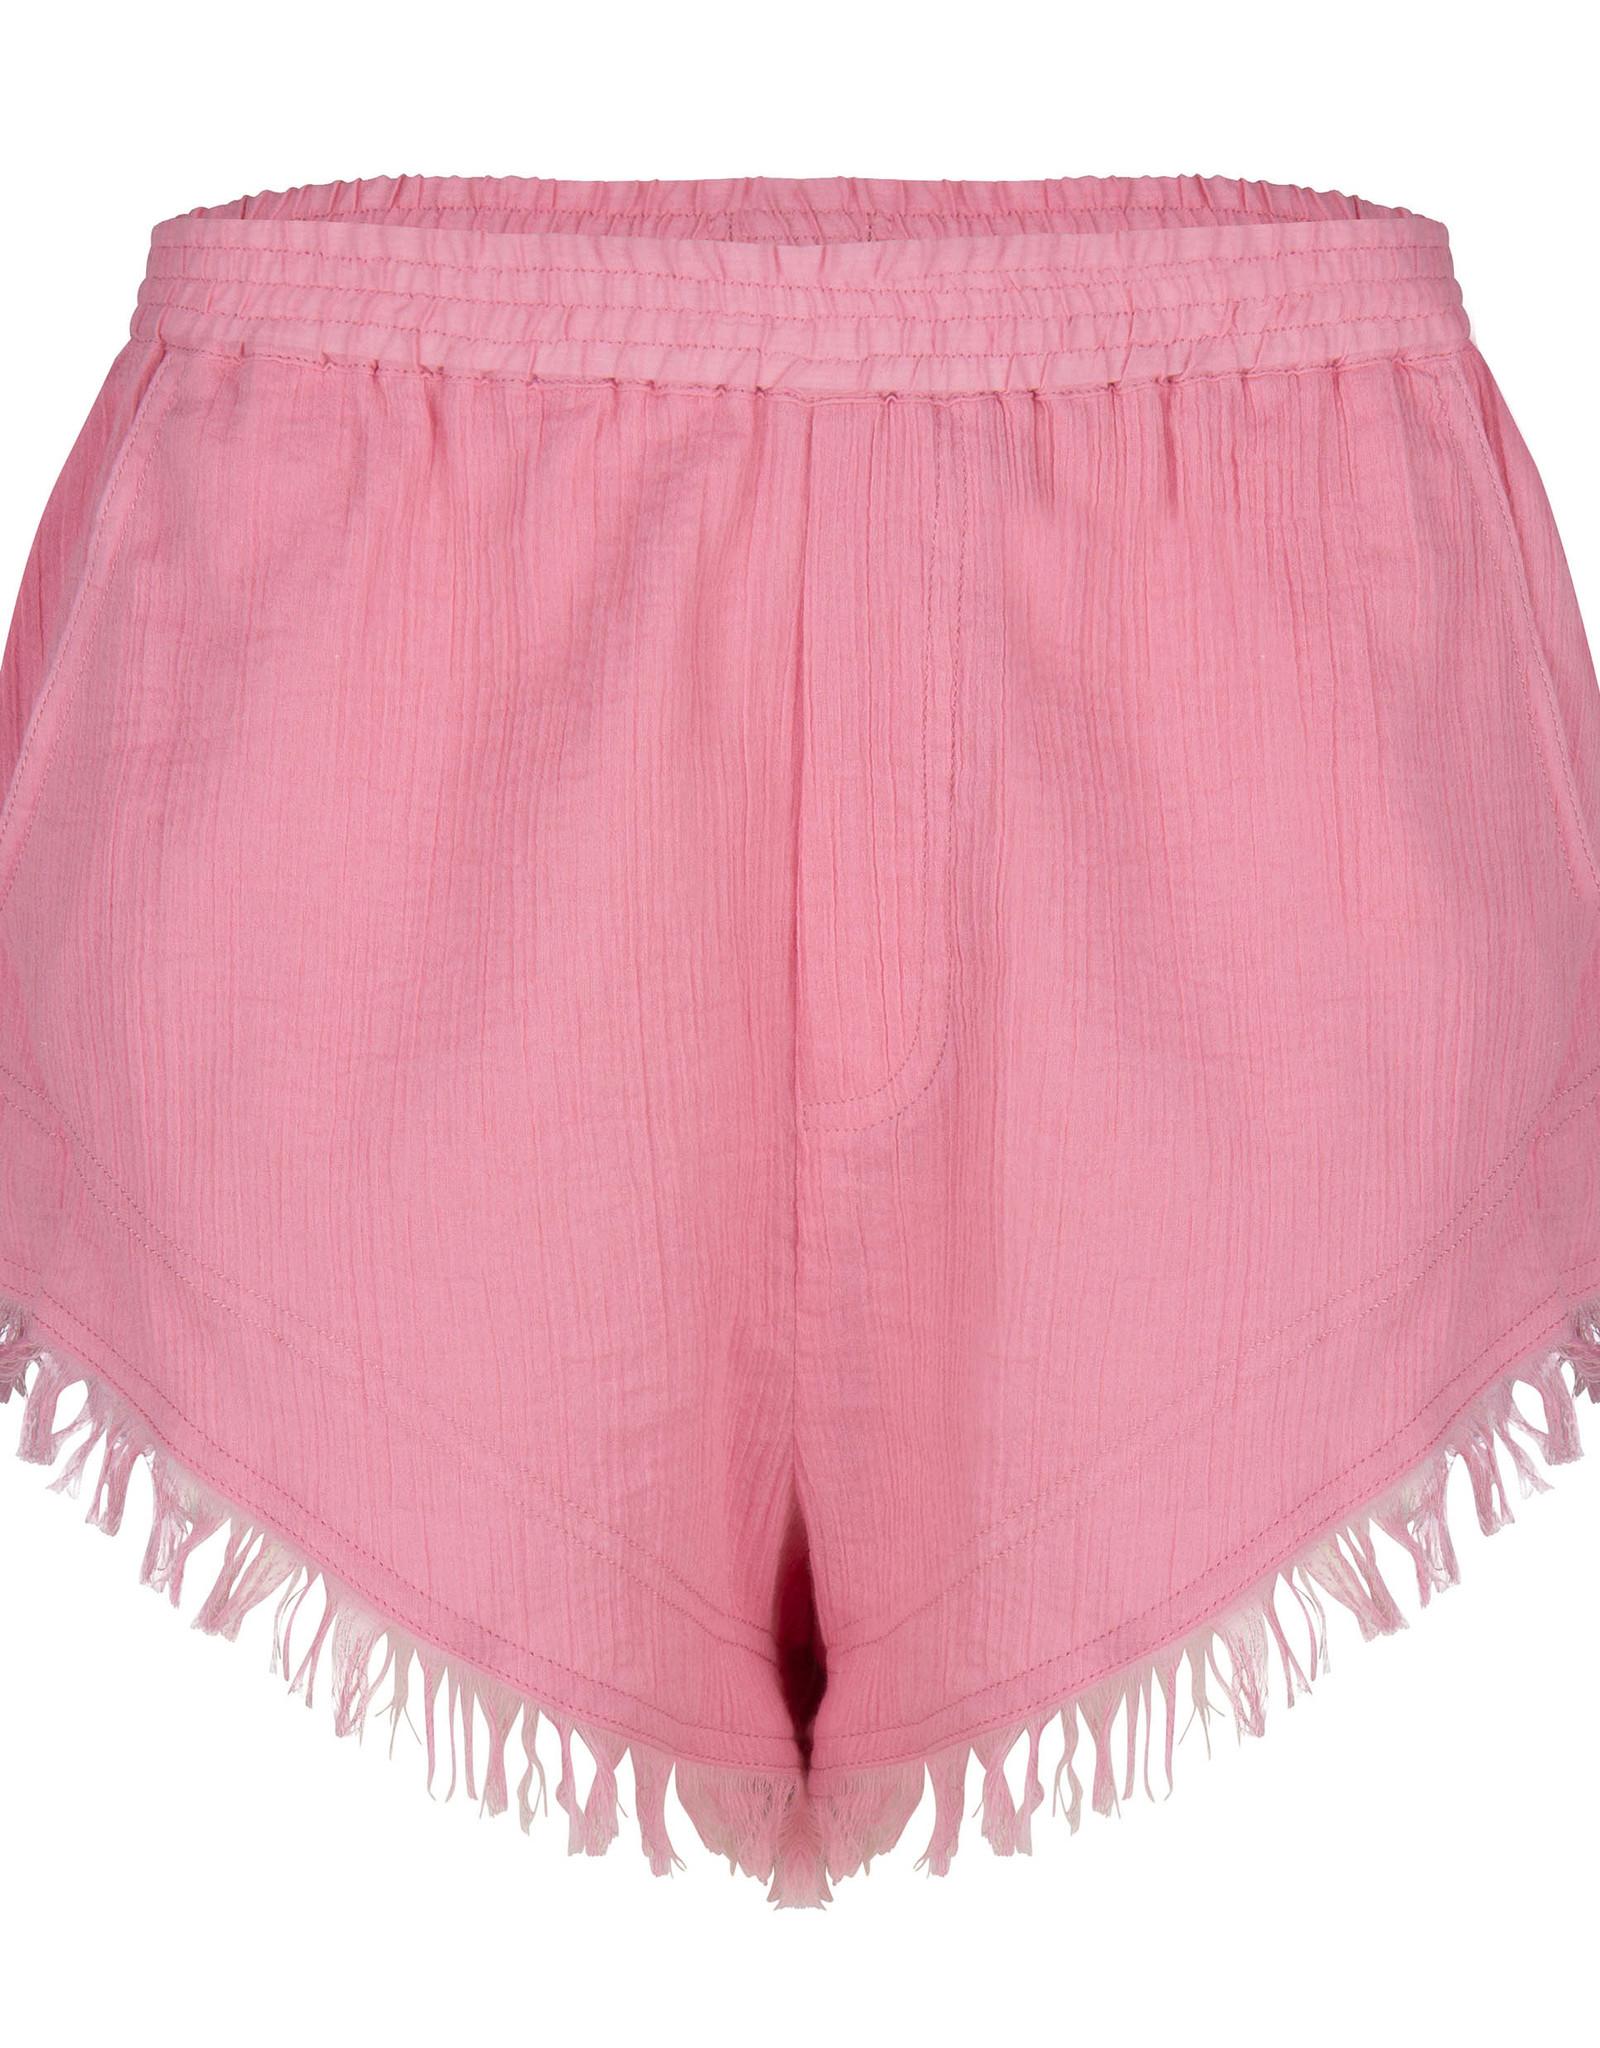 Love Stories Mabel Shorts Pink XS